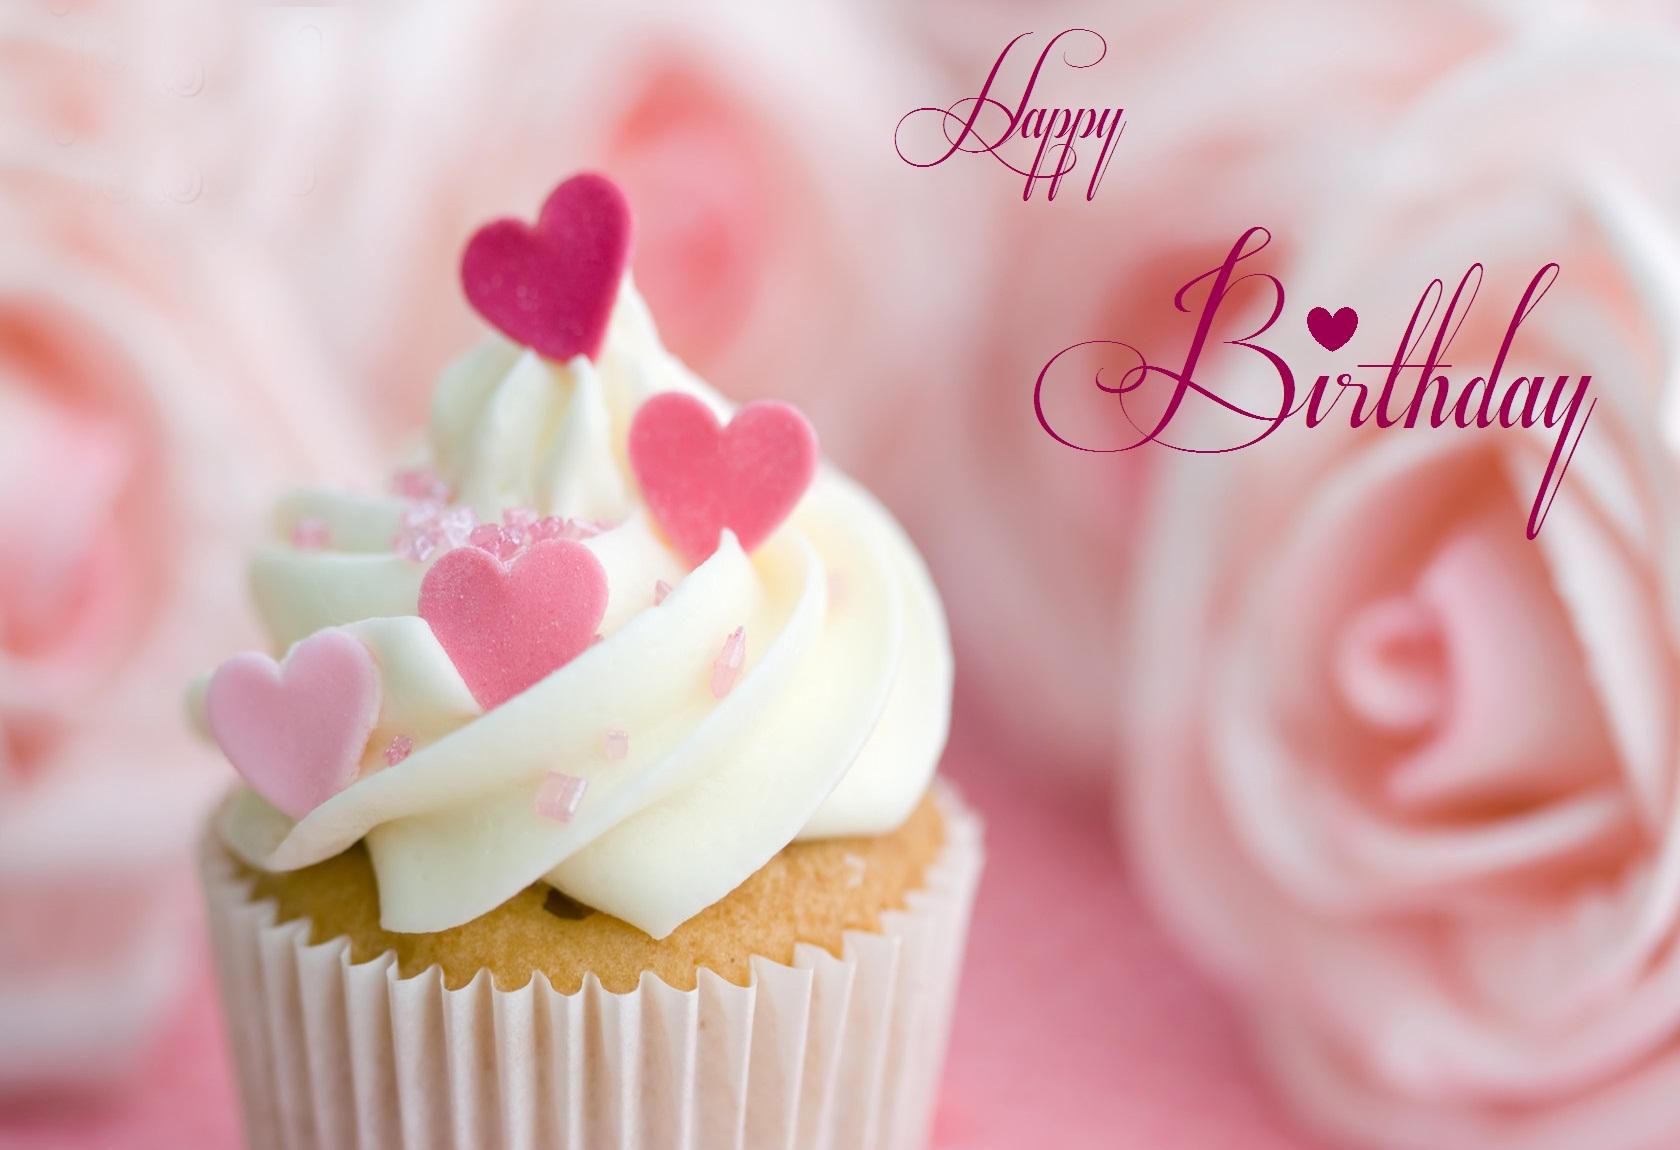 happy birthday wishes hd wallpaper 1680x1150 1680x1150